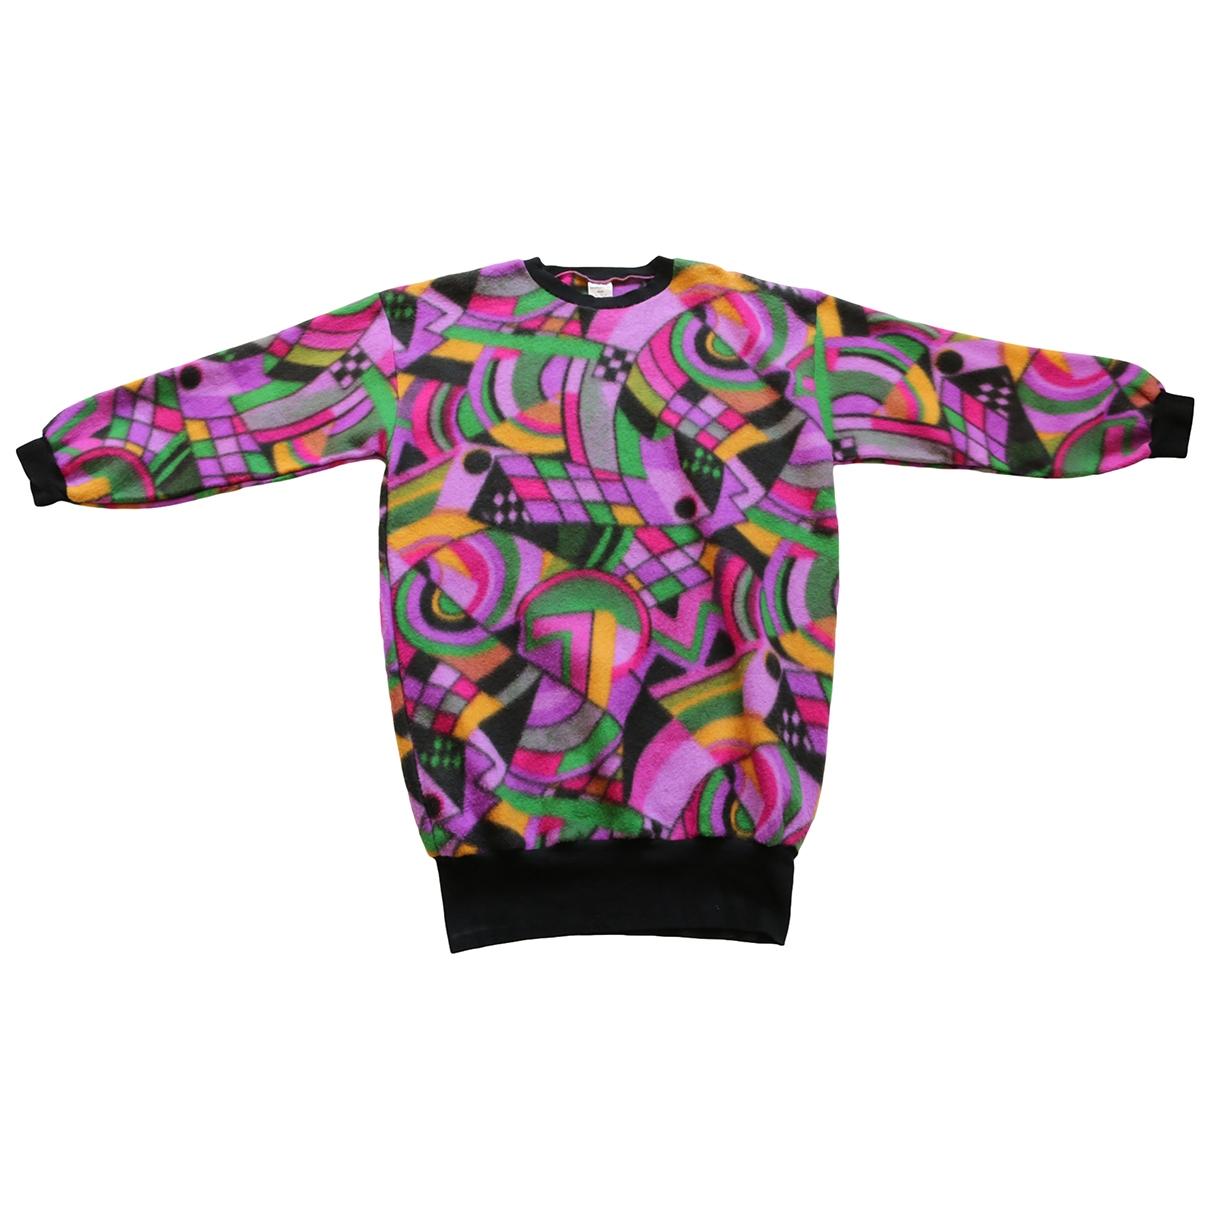 - Pull Oversize pour femme - multicolore